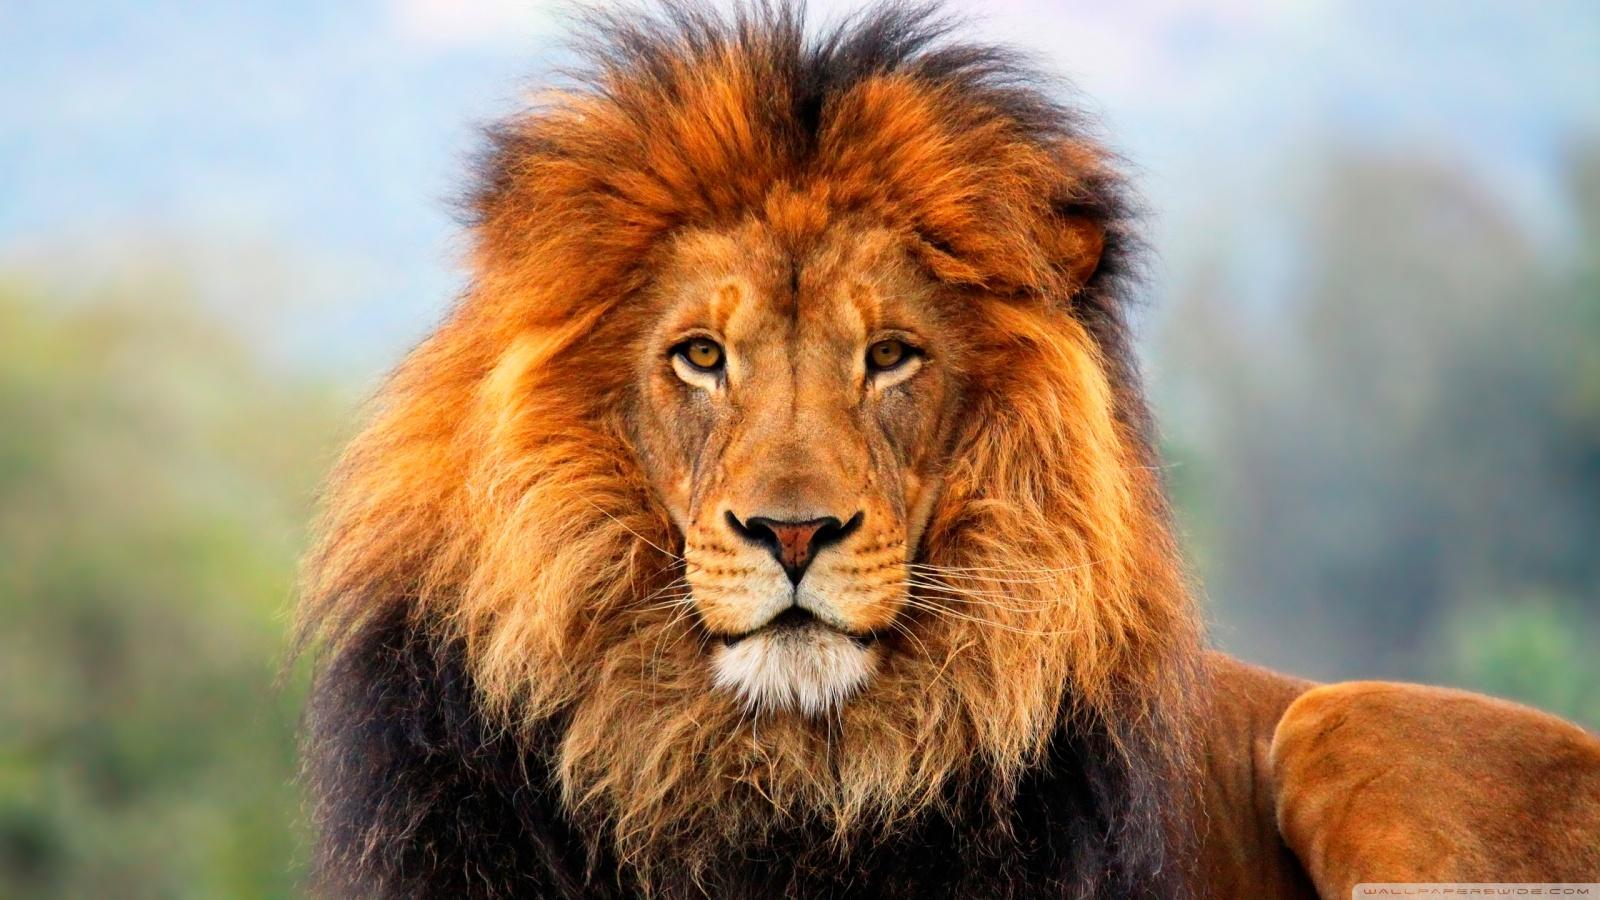 Schleich Lion Roaring Toy Figure  amazoncom